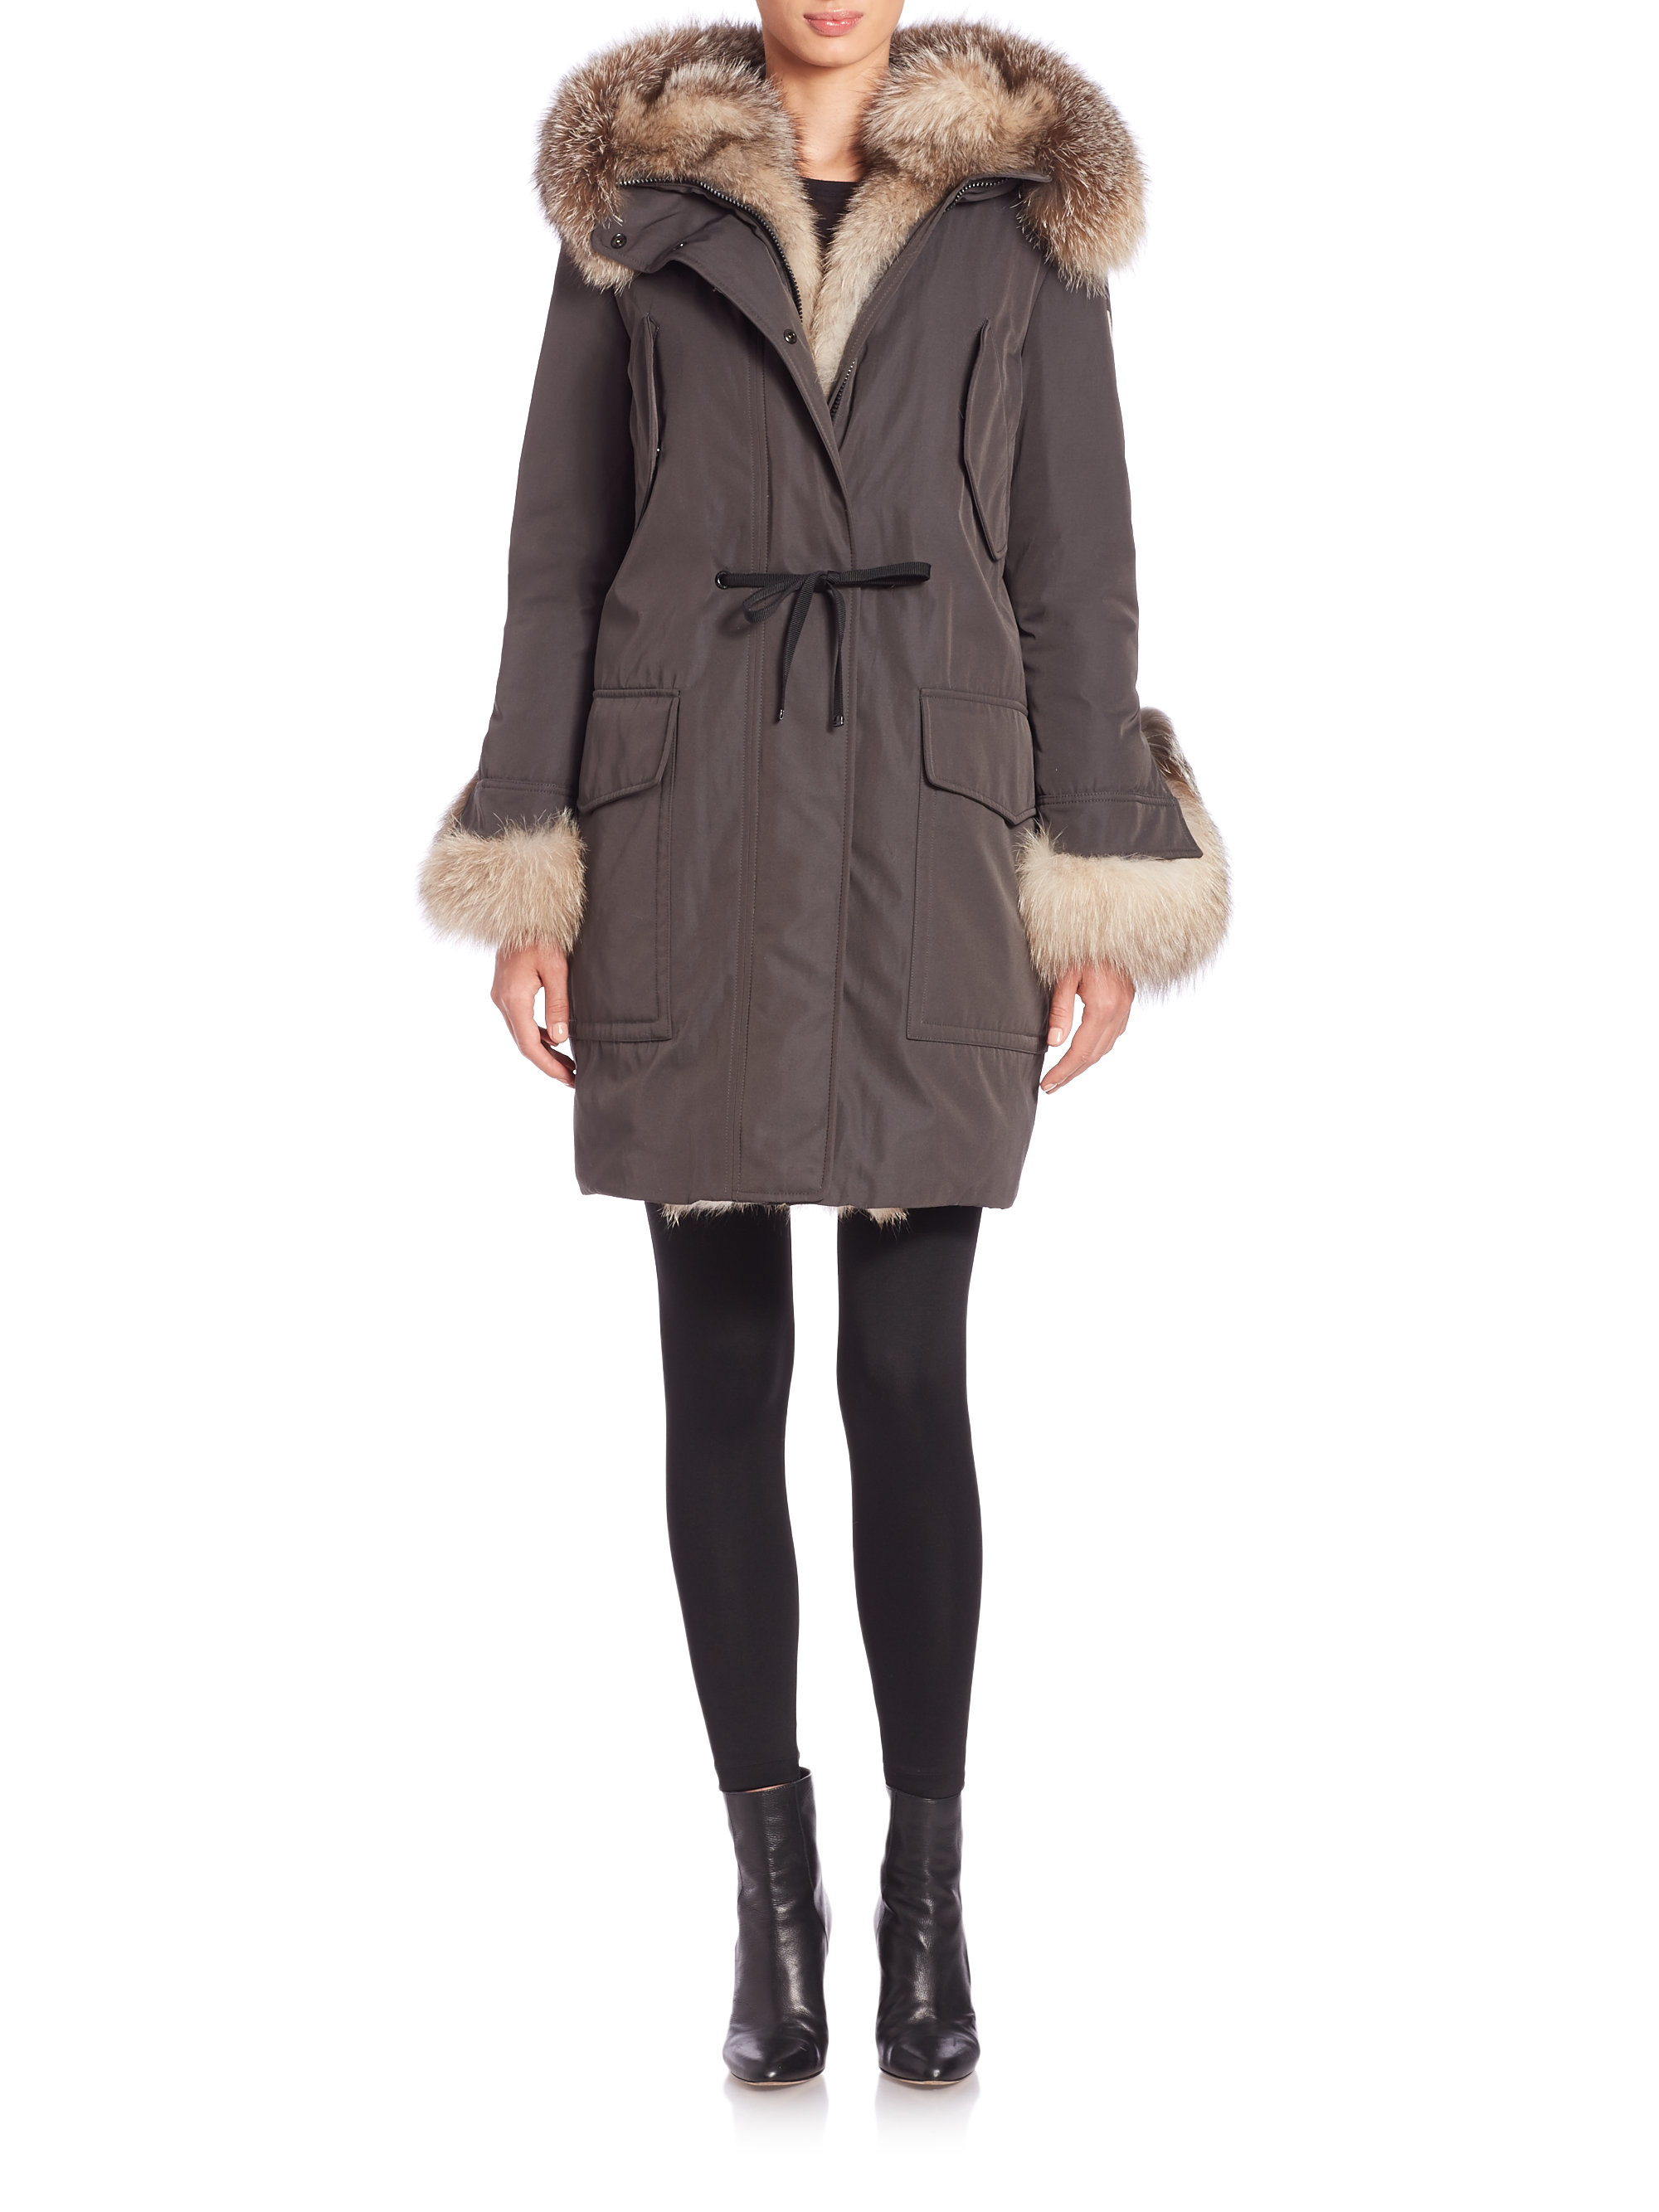 bfc2f901a germany moncler coat fur trim b0e52 e2e0a